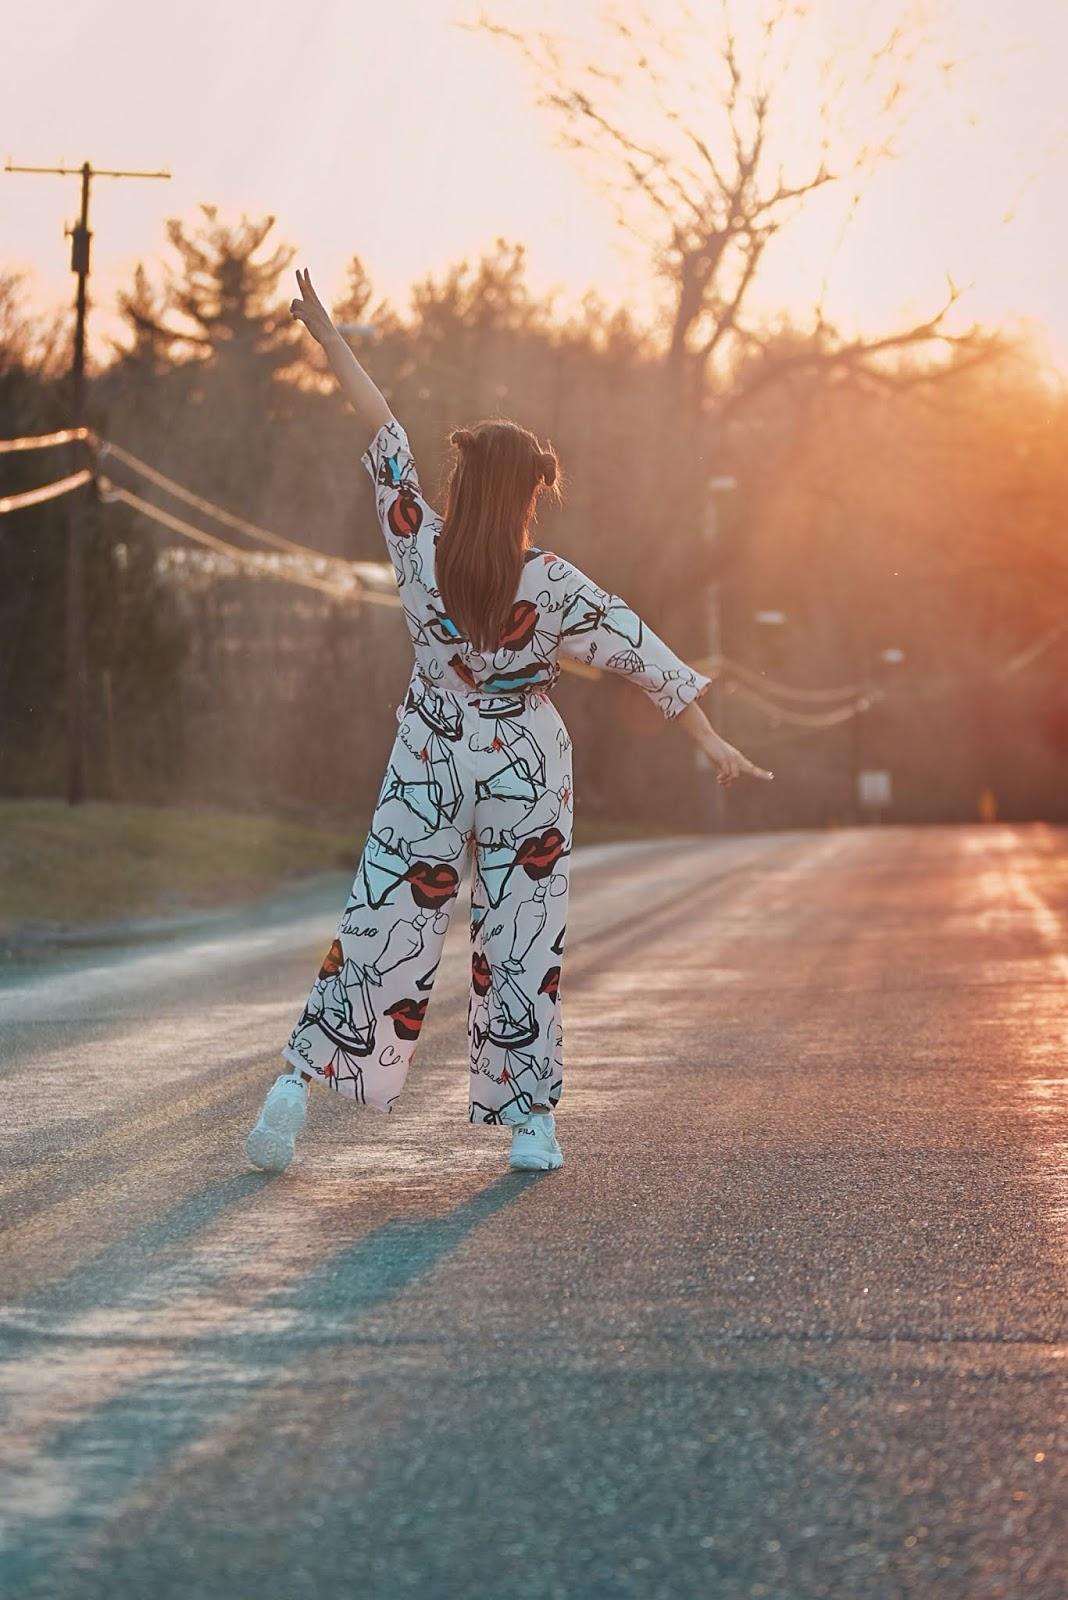 Drawstring Waist Graffiti Print Wide Leg Shirt Jumpsuit-mariestilo-sheinfestival-coachella-coachella 2019-festival mood-dessert style-travelblogger-dcblogger-modaelsalvador-marisolflamenco-